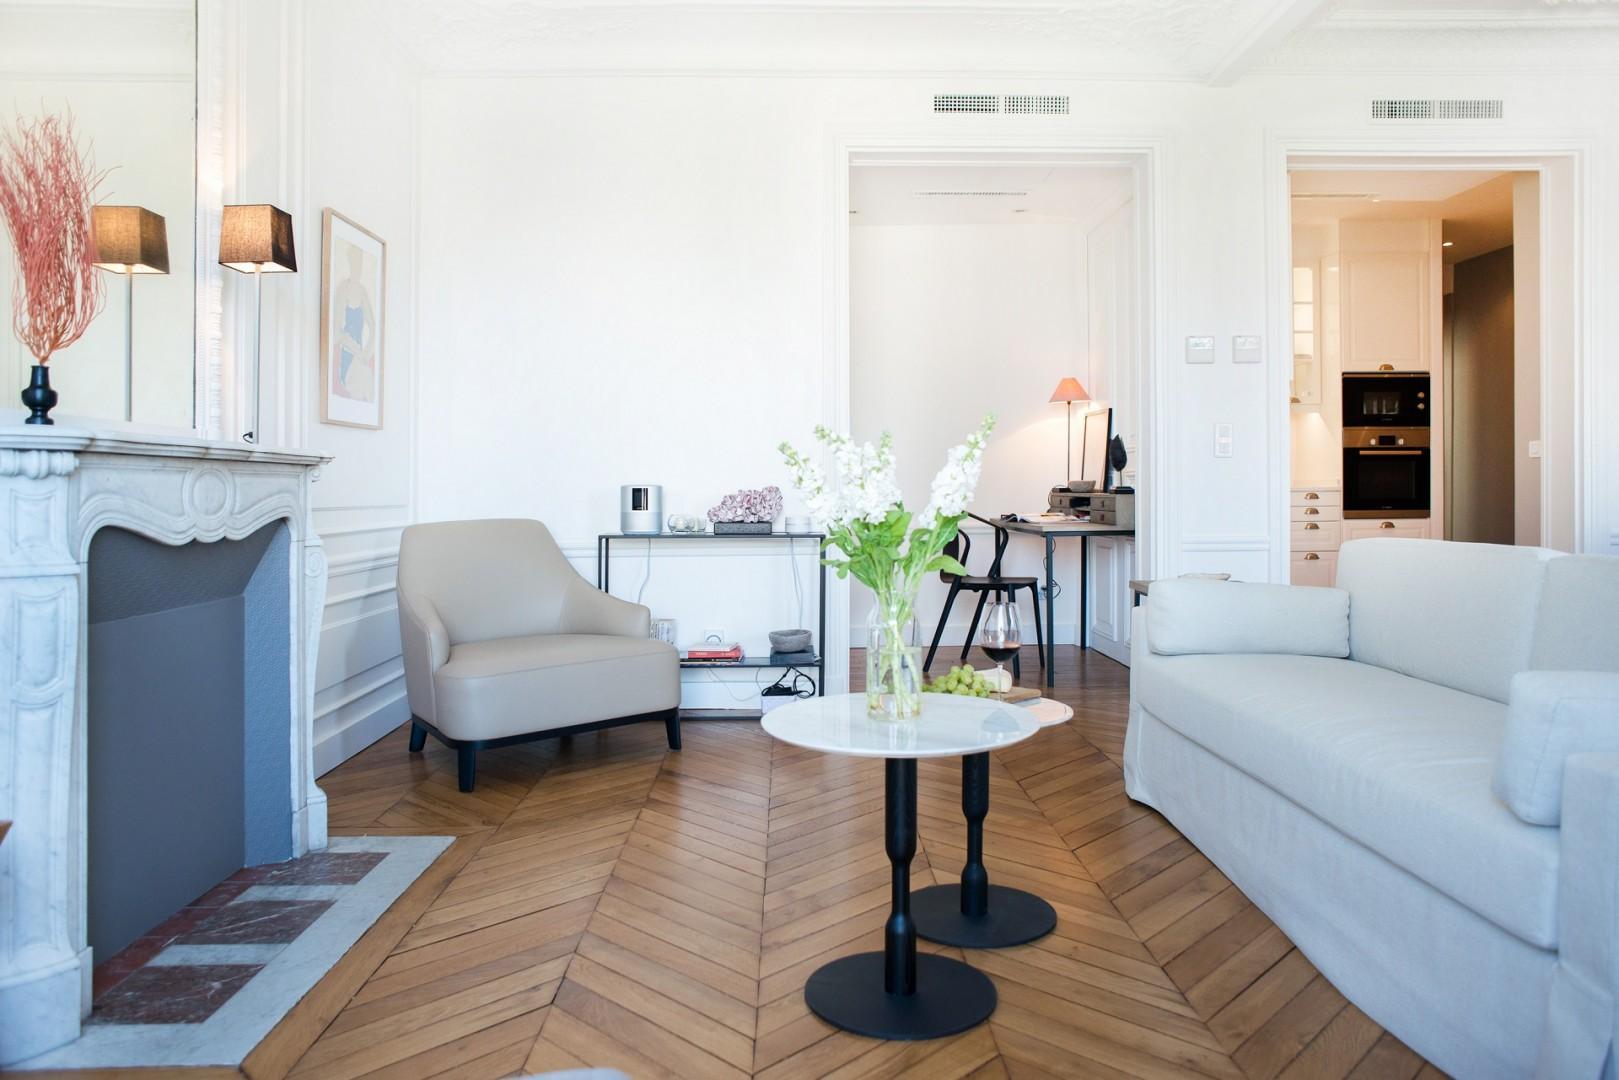 Enjoy the original fireplace mantle and modern design furniture.